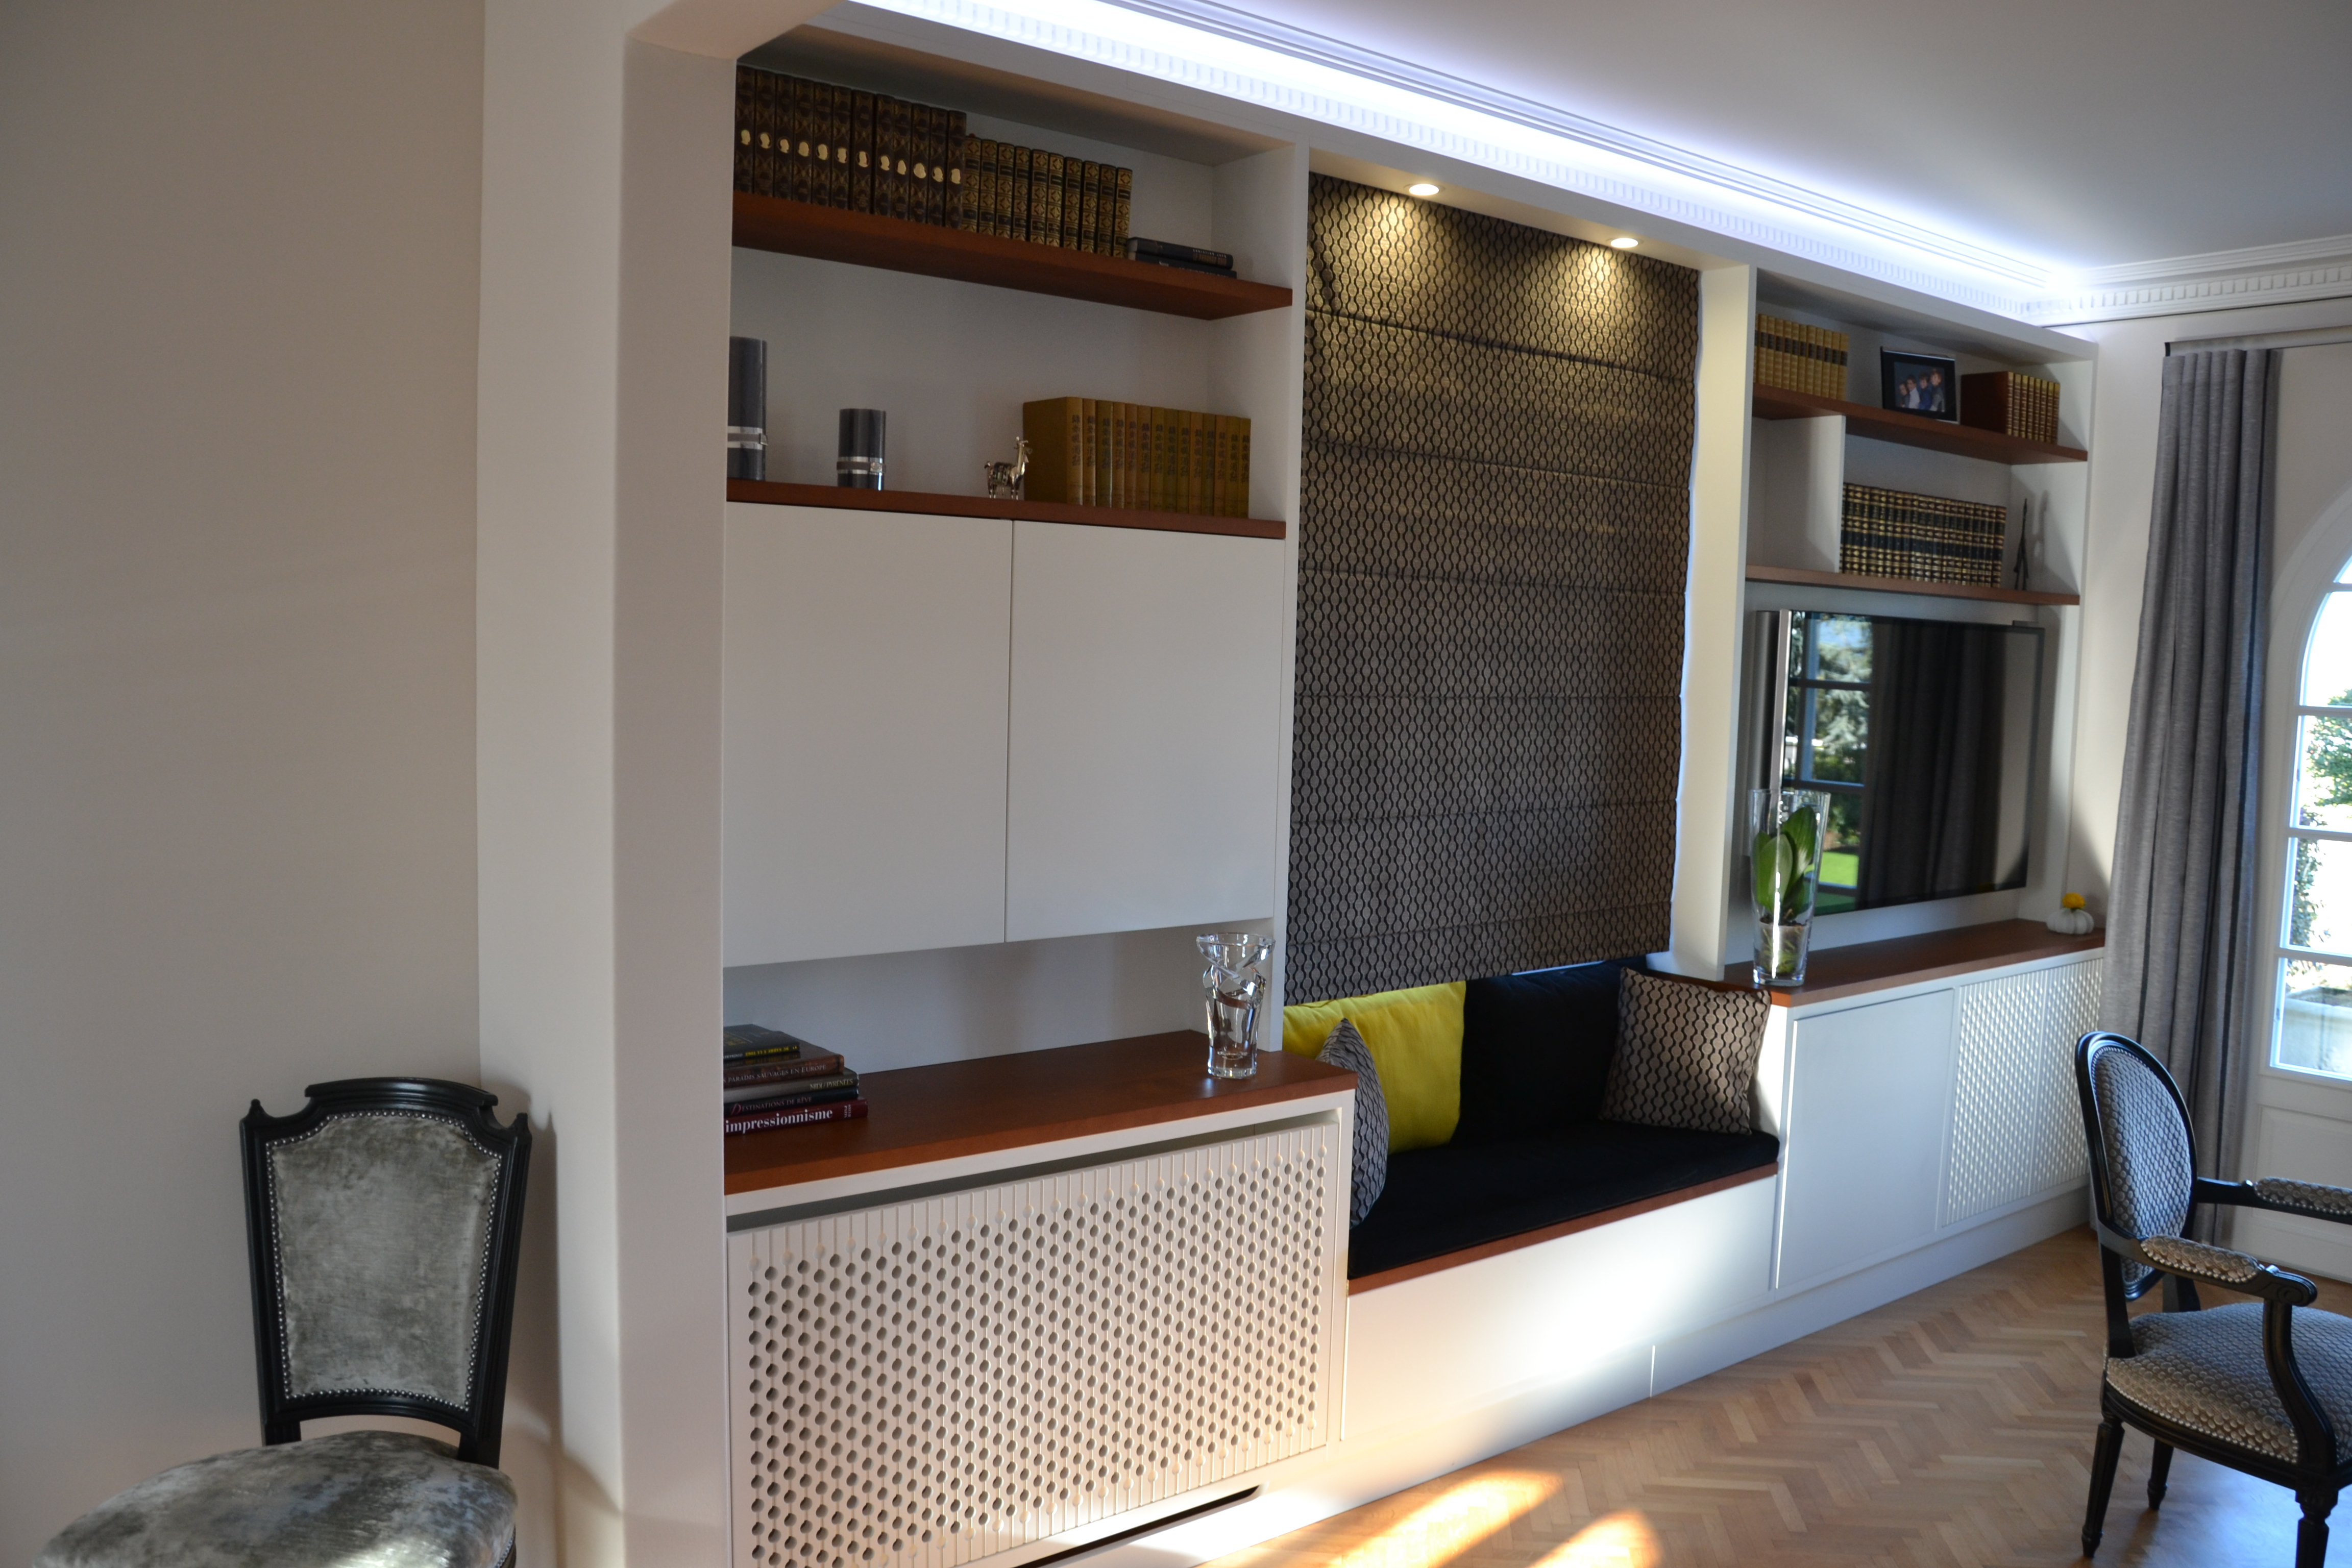 maison art deco - 1 - geraldine fourny - decoratrice - nantes - 44